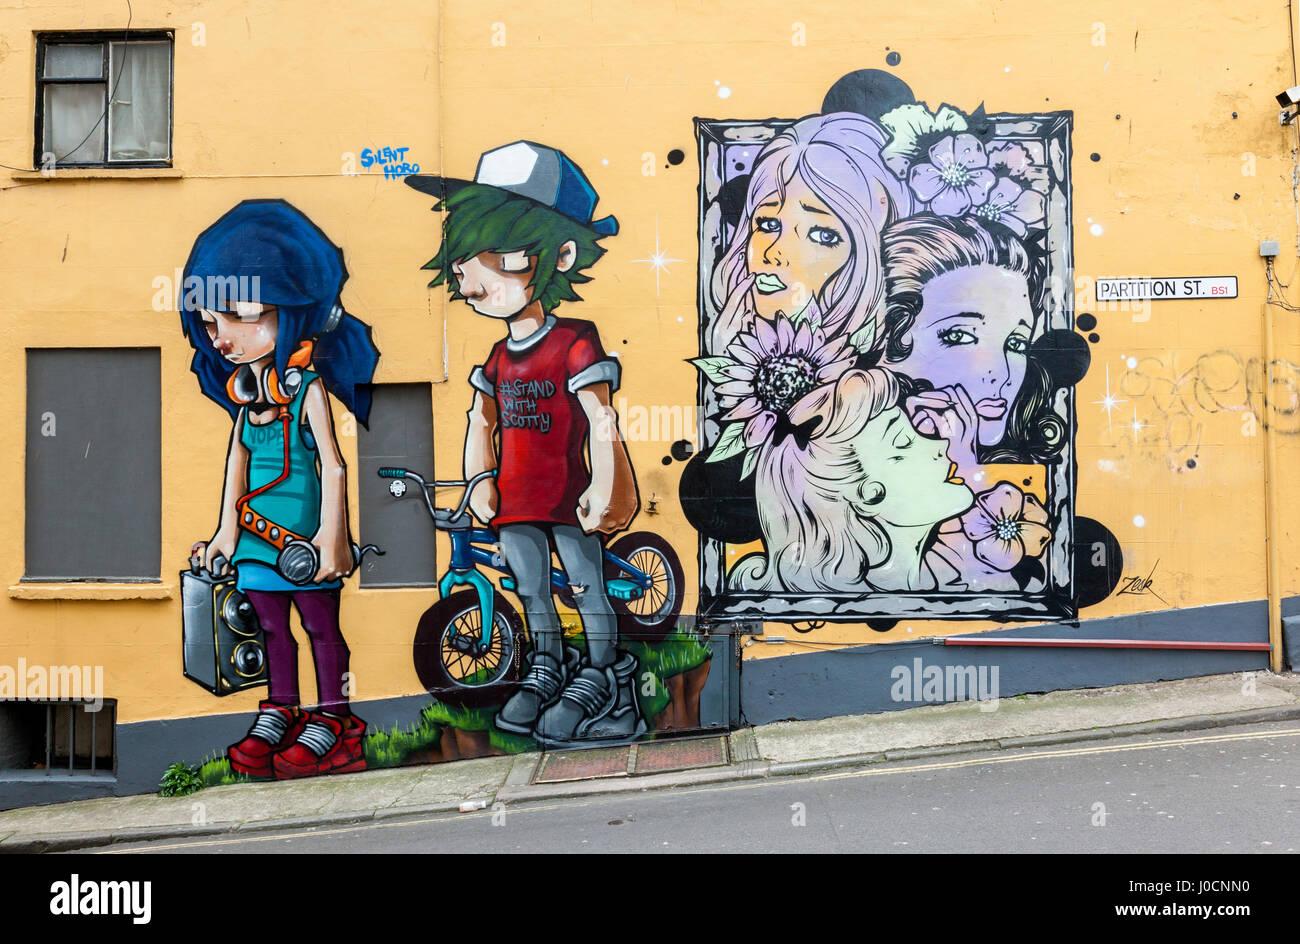 Wall art on the wall of Three Tuns pub, Partition Street, Bristol, UK - Stock Image